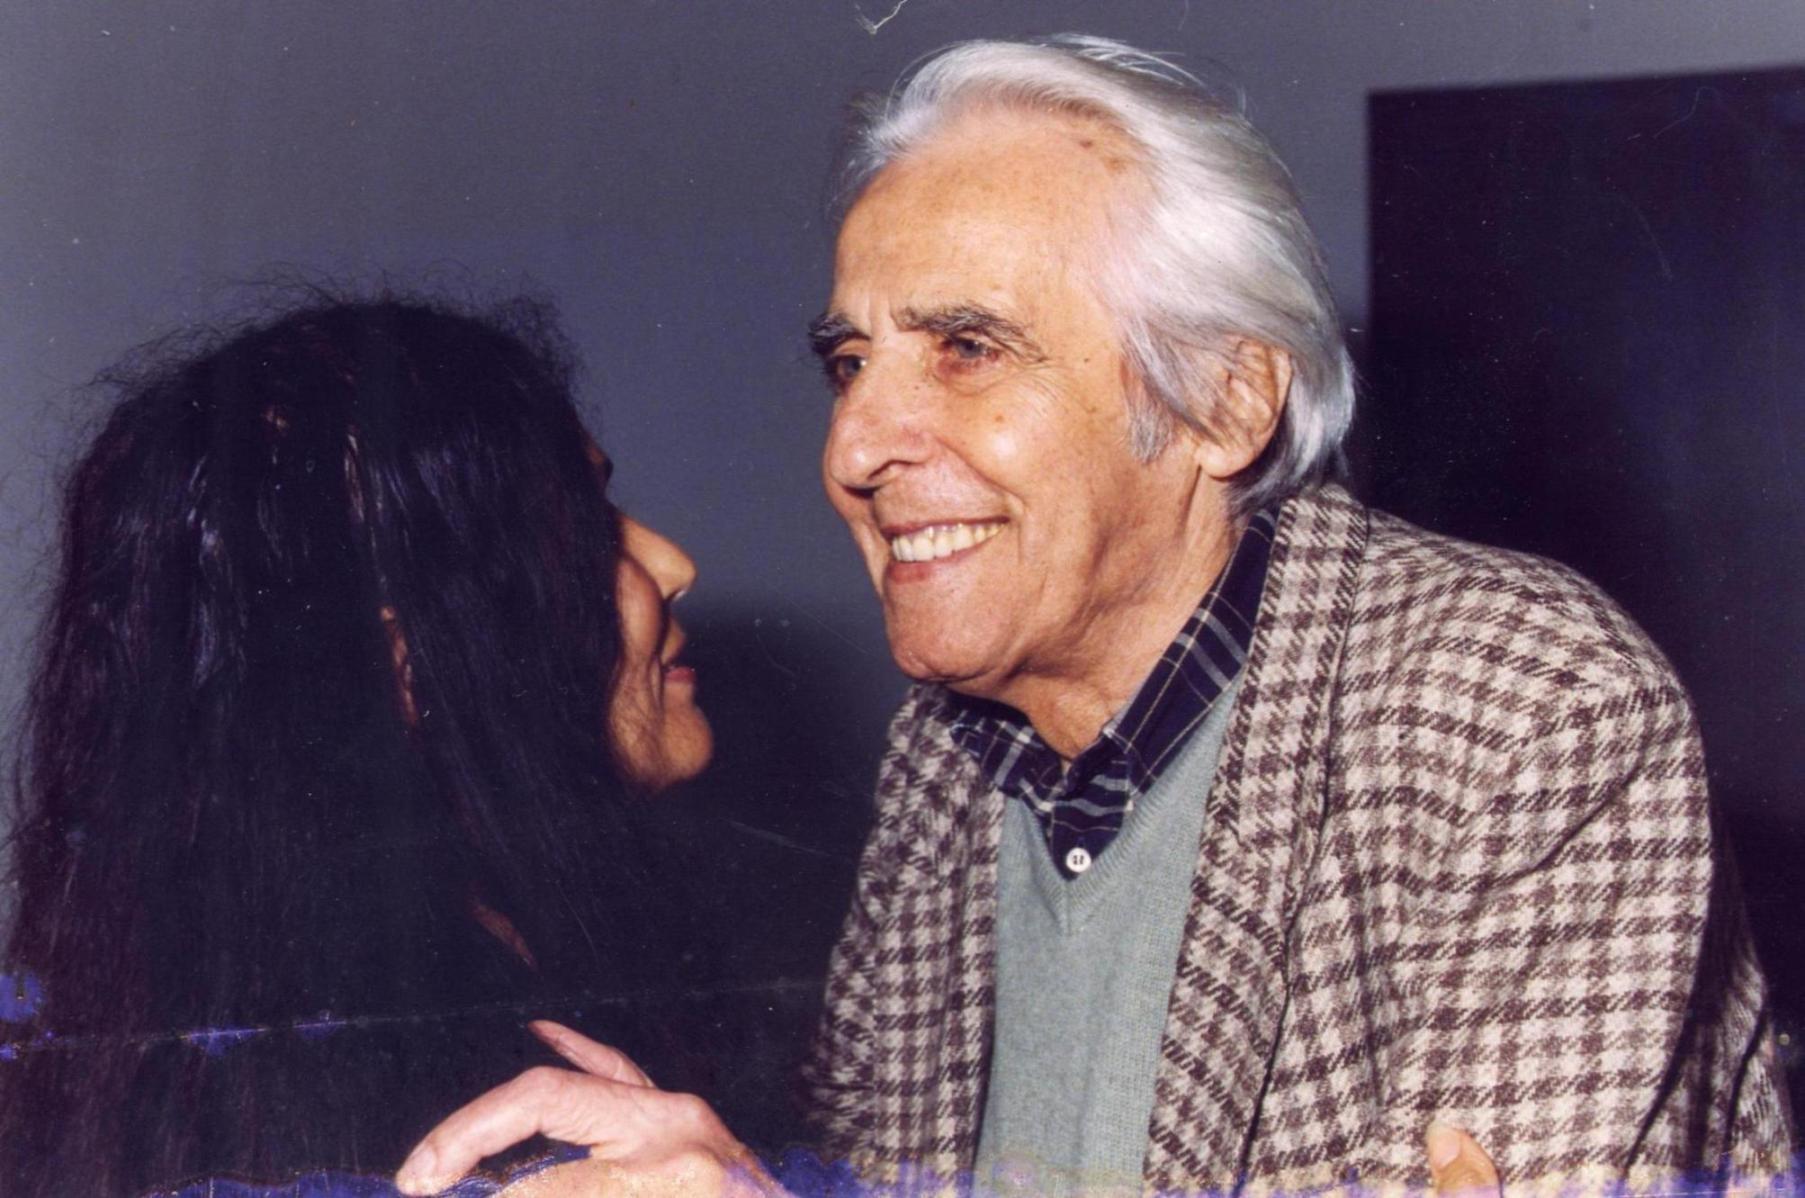 Mario Uggeri